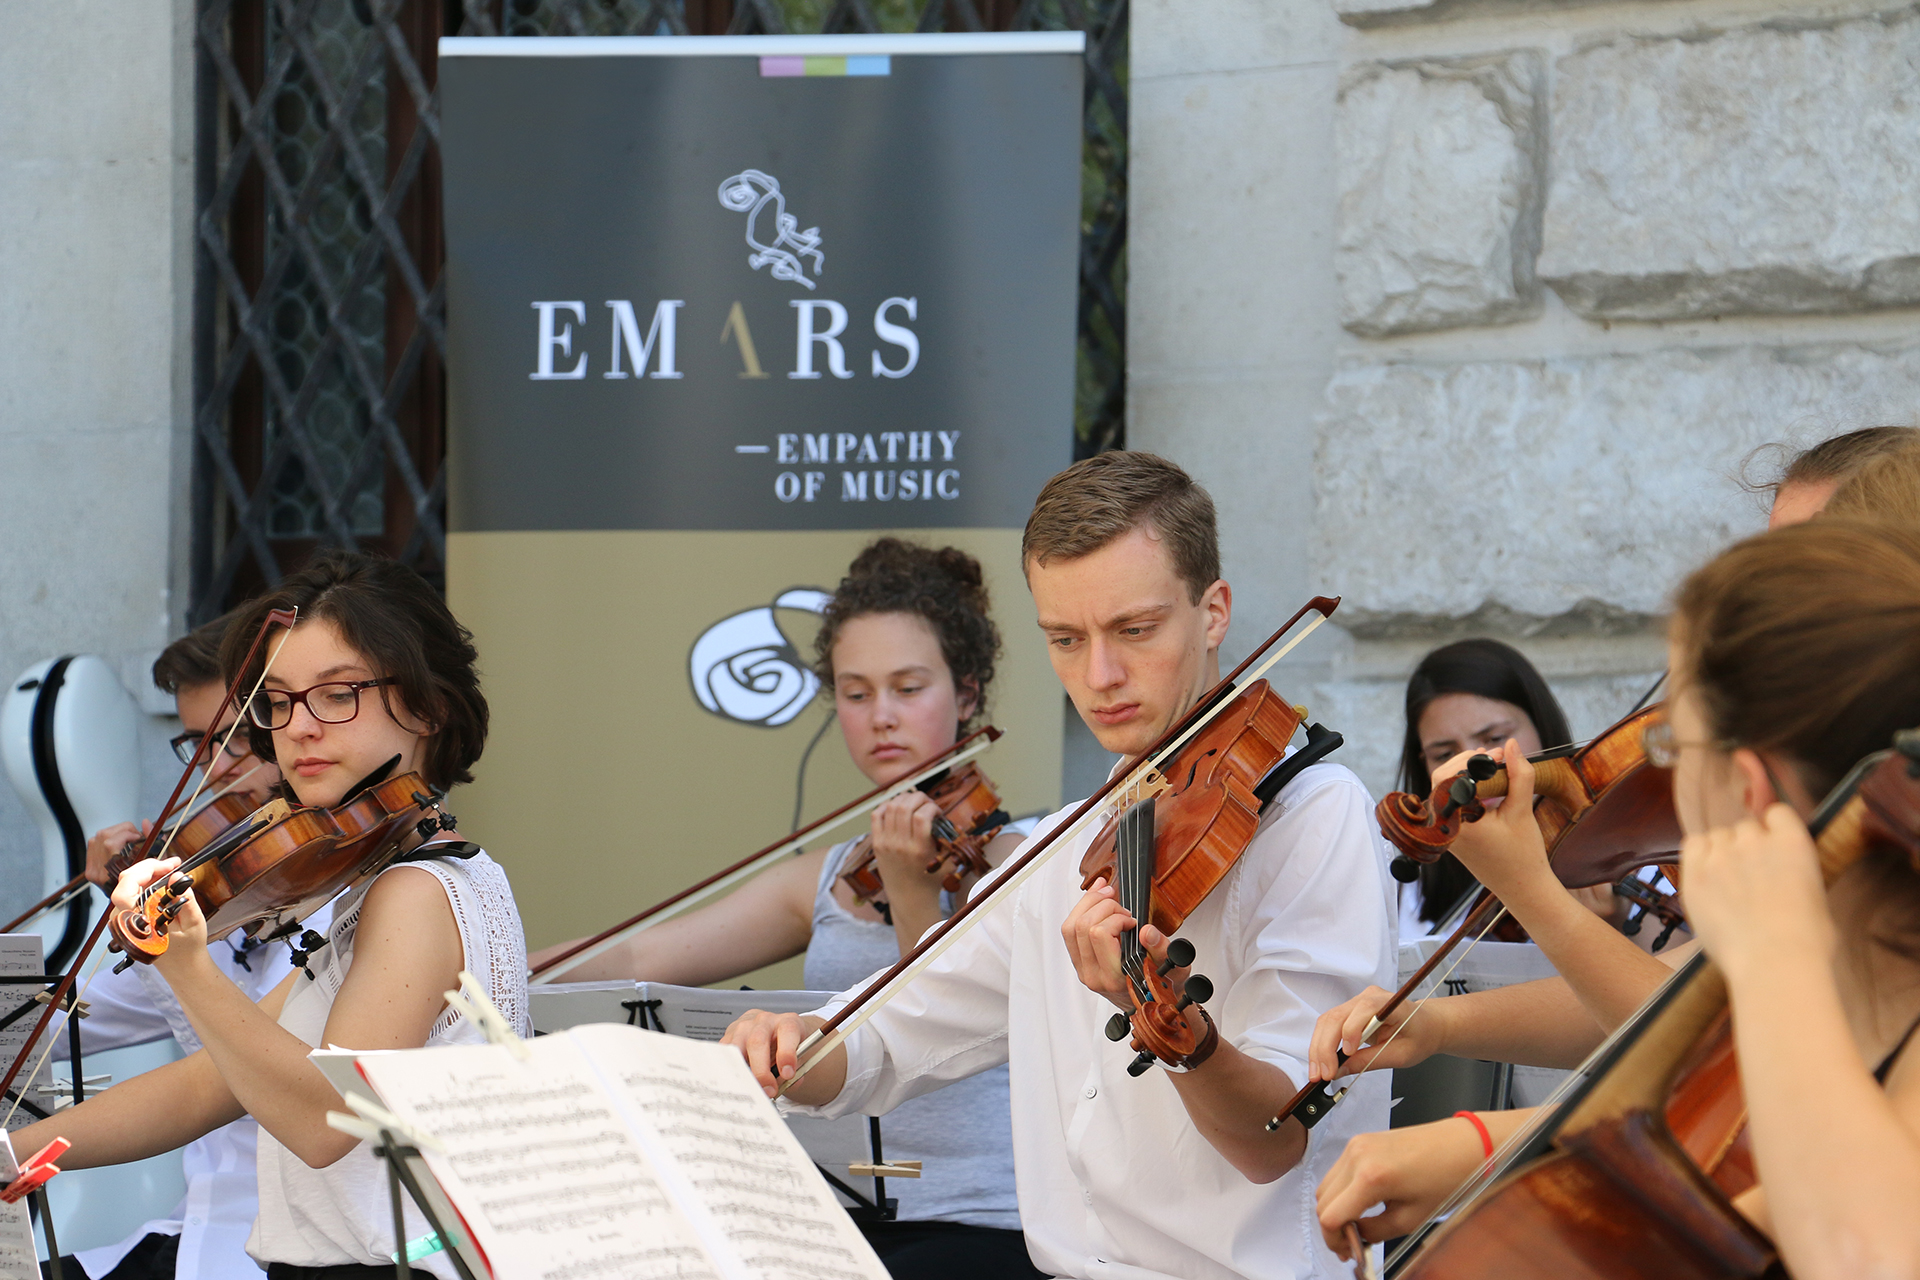 emars_fotografija_koncert1a